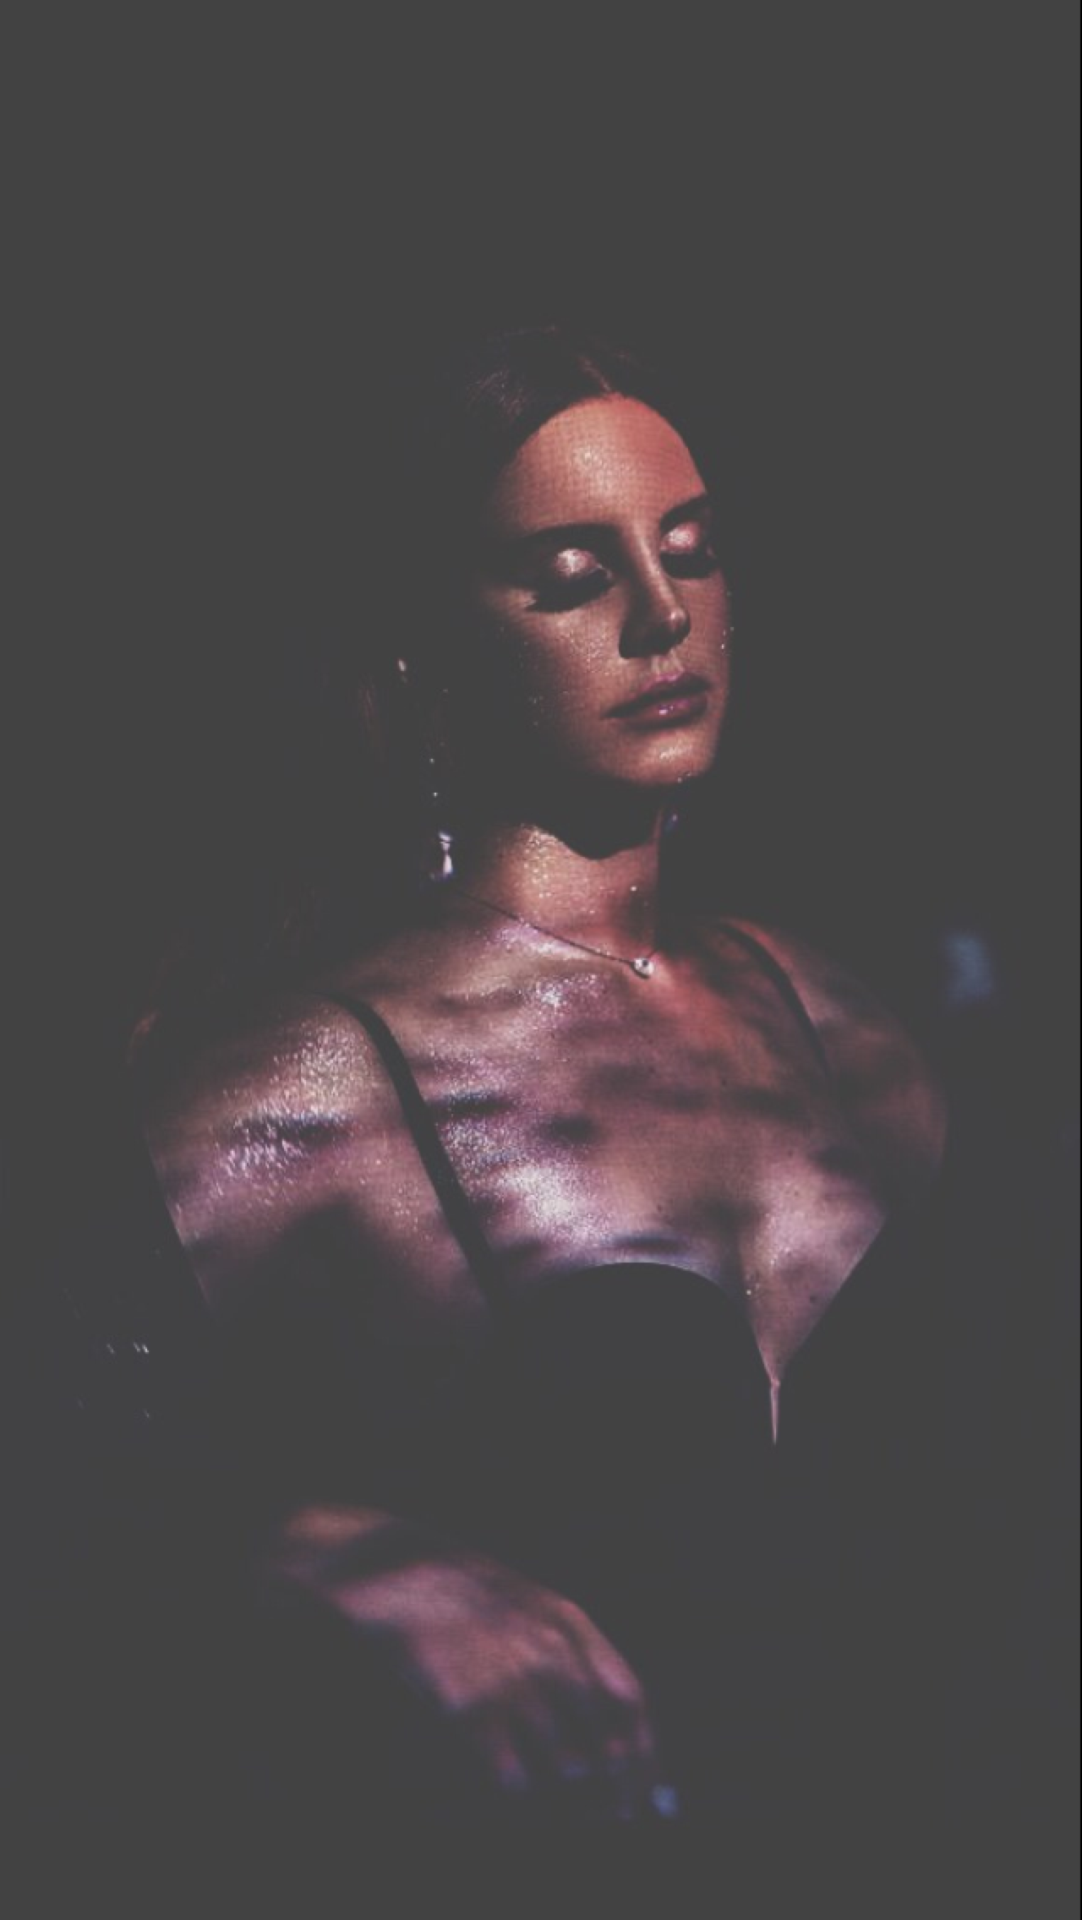 Iphone wallpaper tumblr lana - Lana Del Rey Iphone 5 Ipod 5 Wallpapers